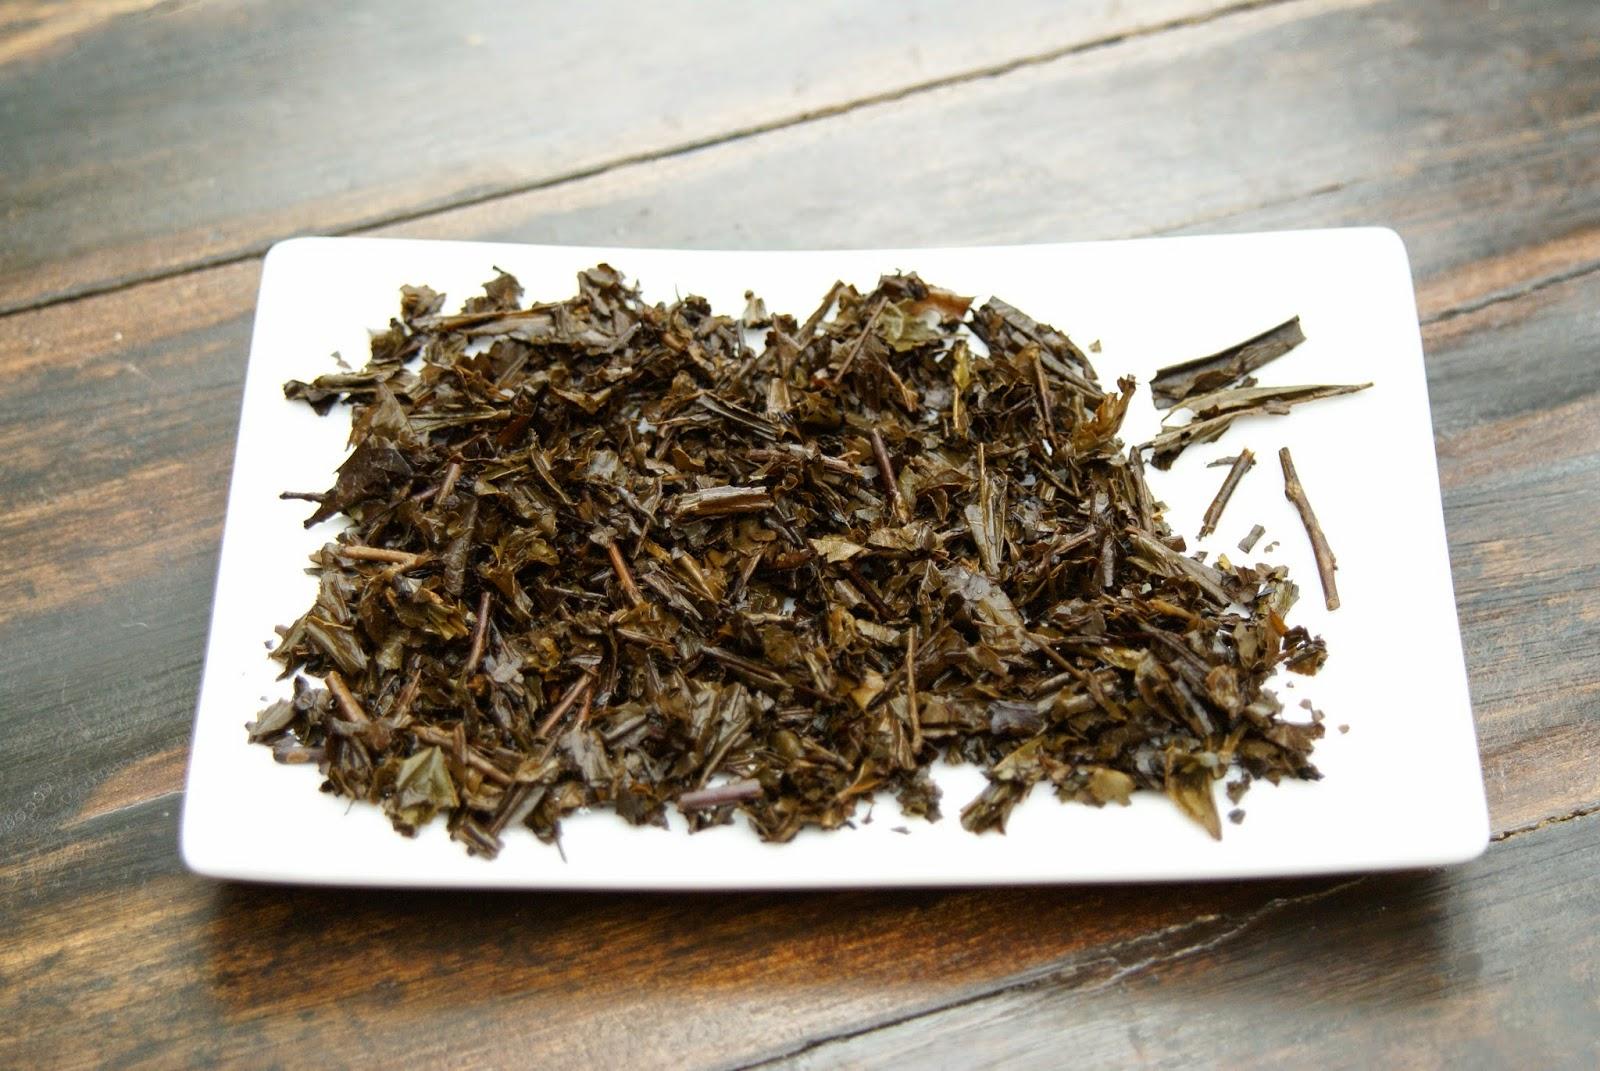 épicerie kioko paris thé